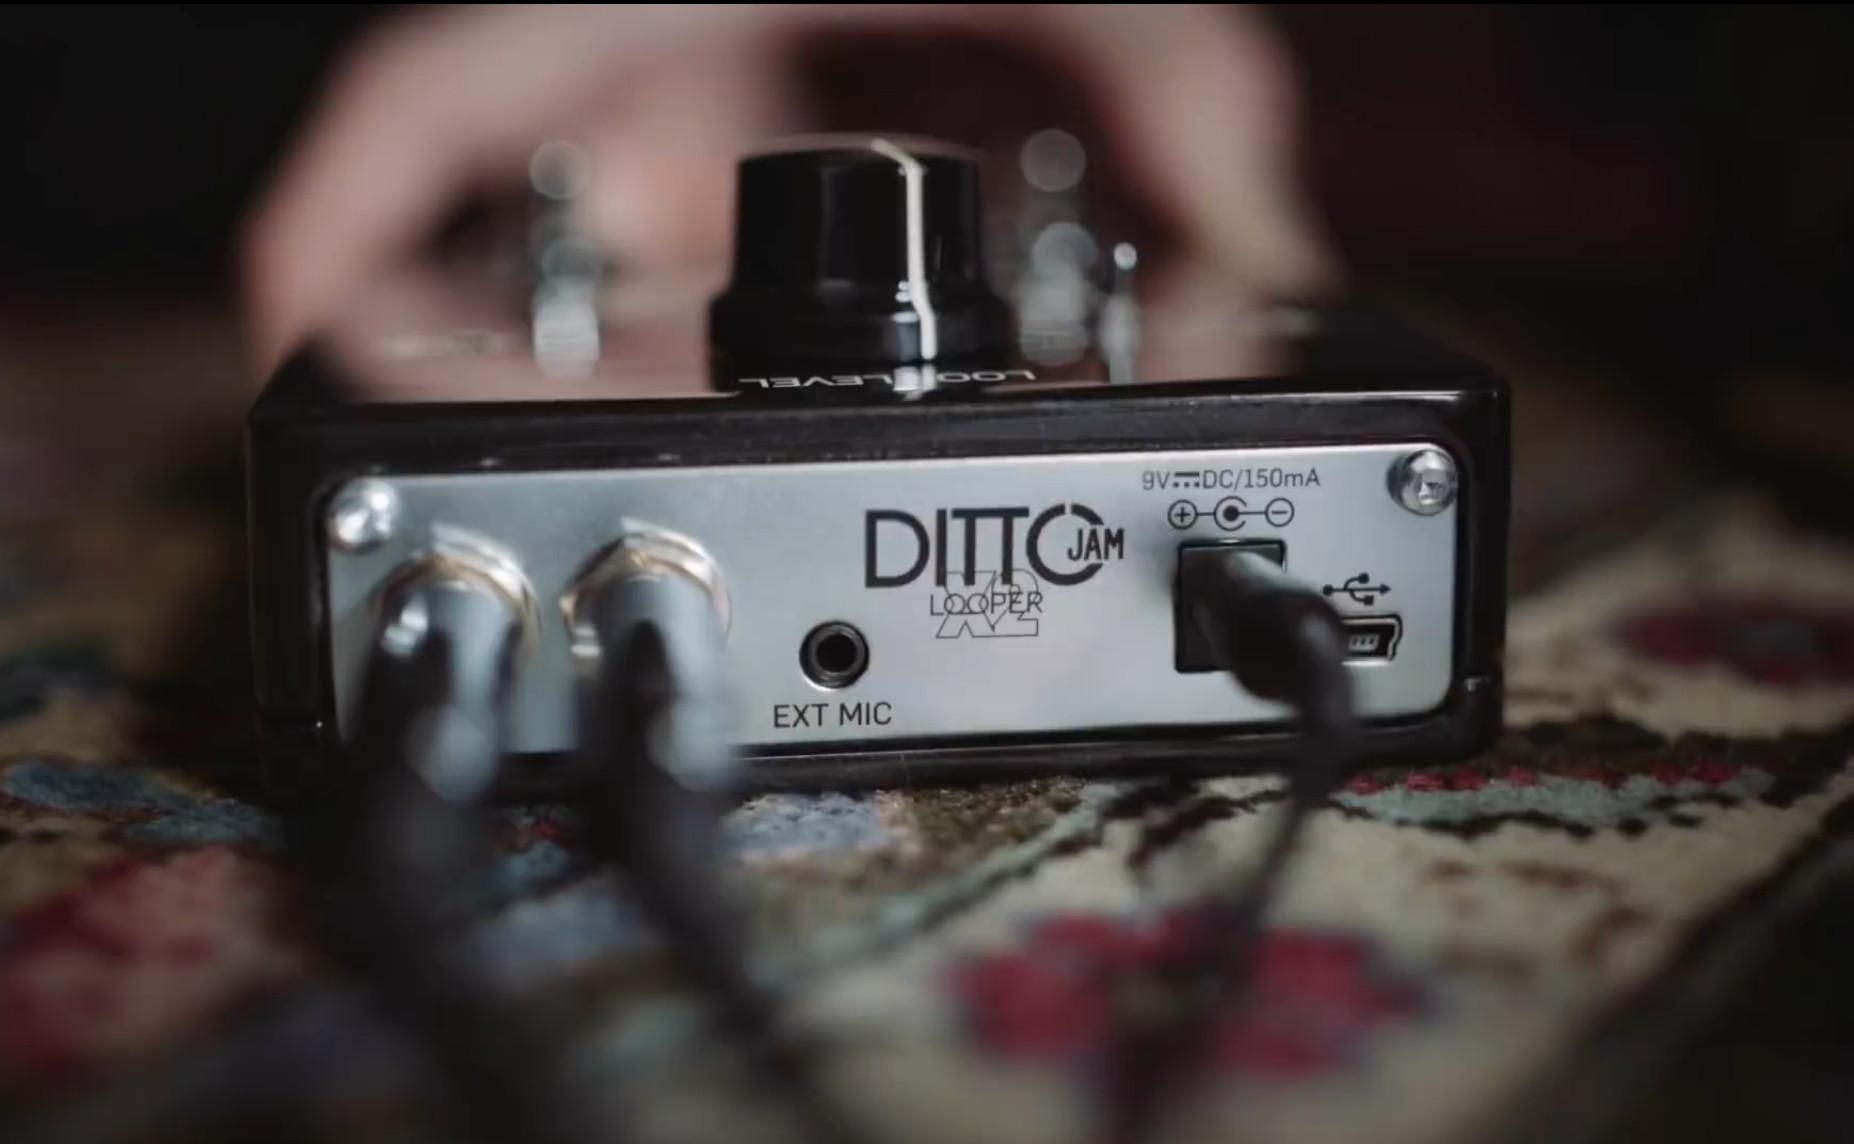 Ditto Jam X2 Looper, zdroj: YouTube